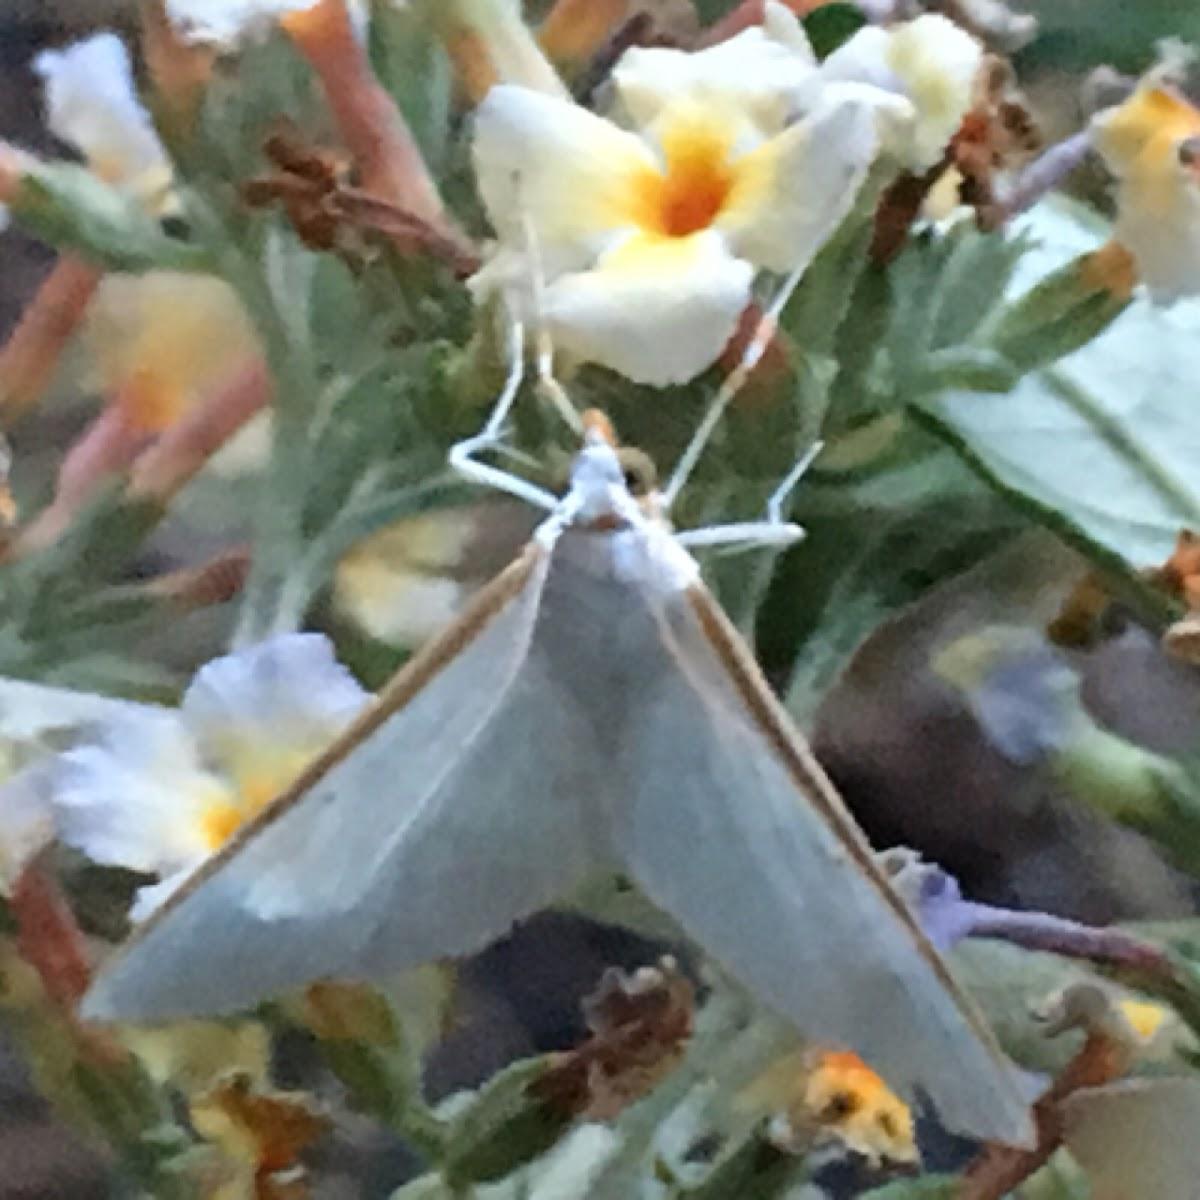 Kimball's palpita moth